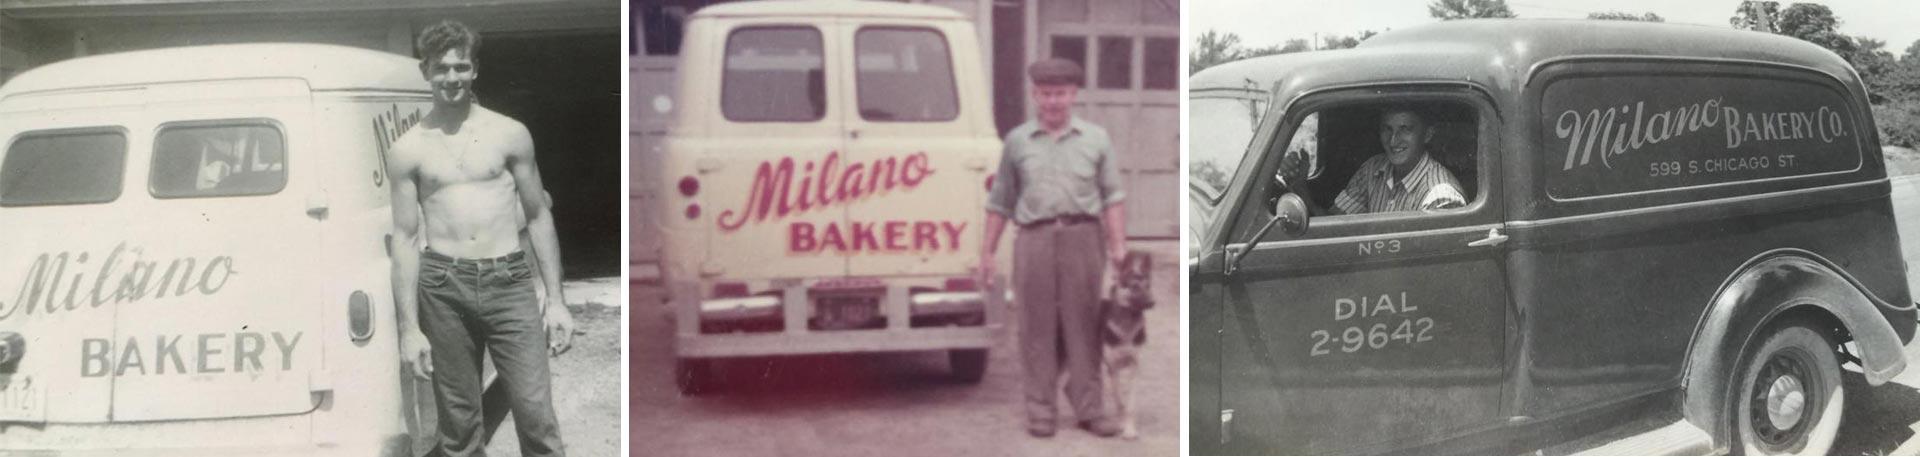 Milano Bakery photo collage of Mario DeBenedetti with Milano Bakery Trucks